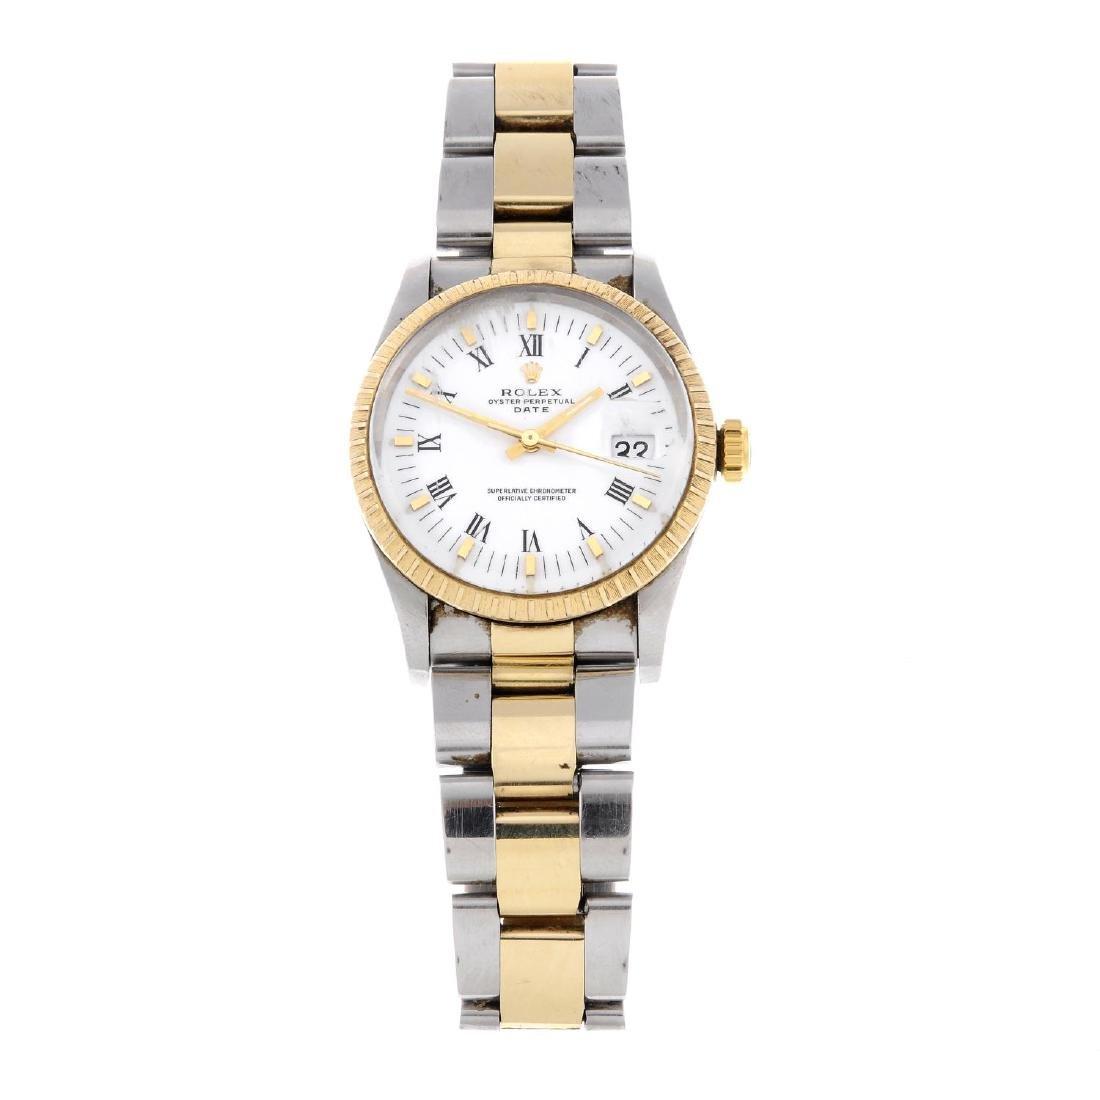 ROLEX - a gentleman's Oyster Perpetual Date bracelet